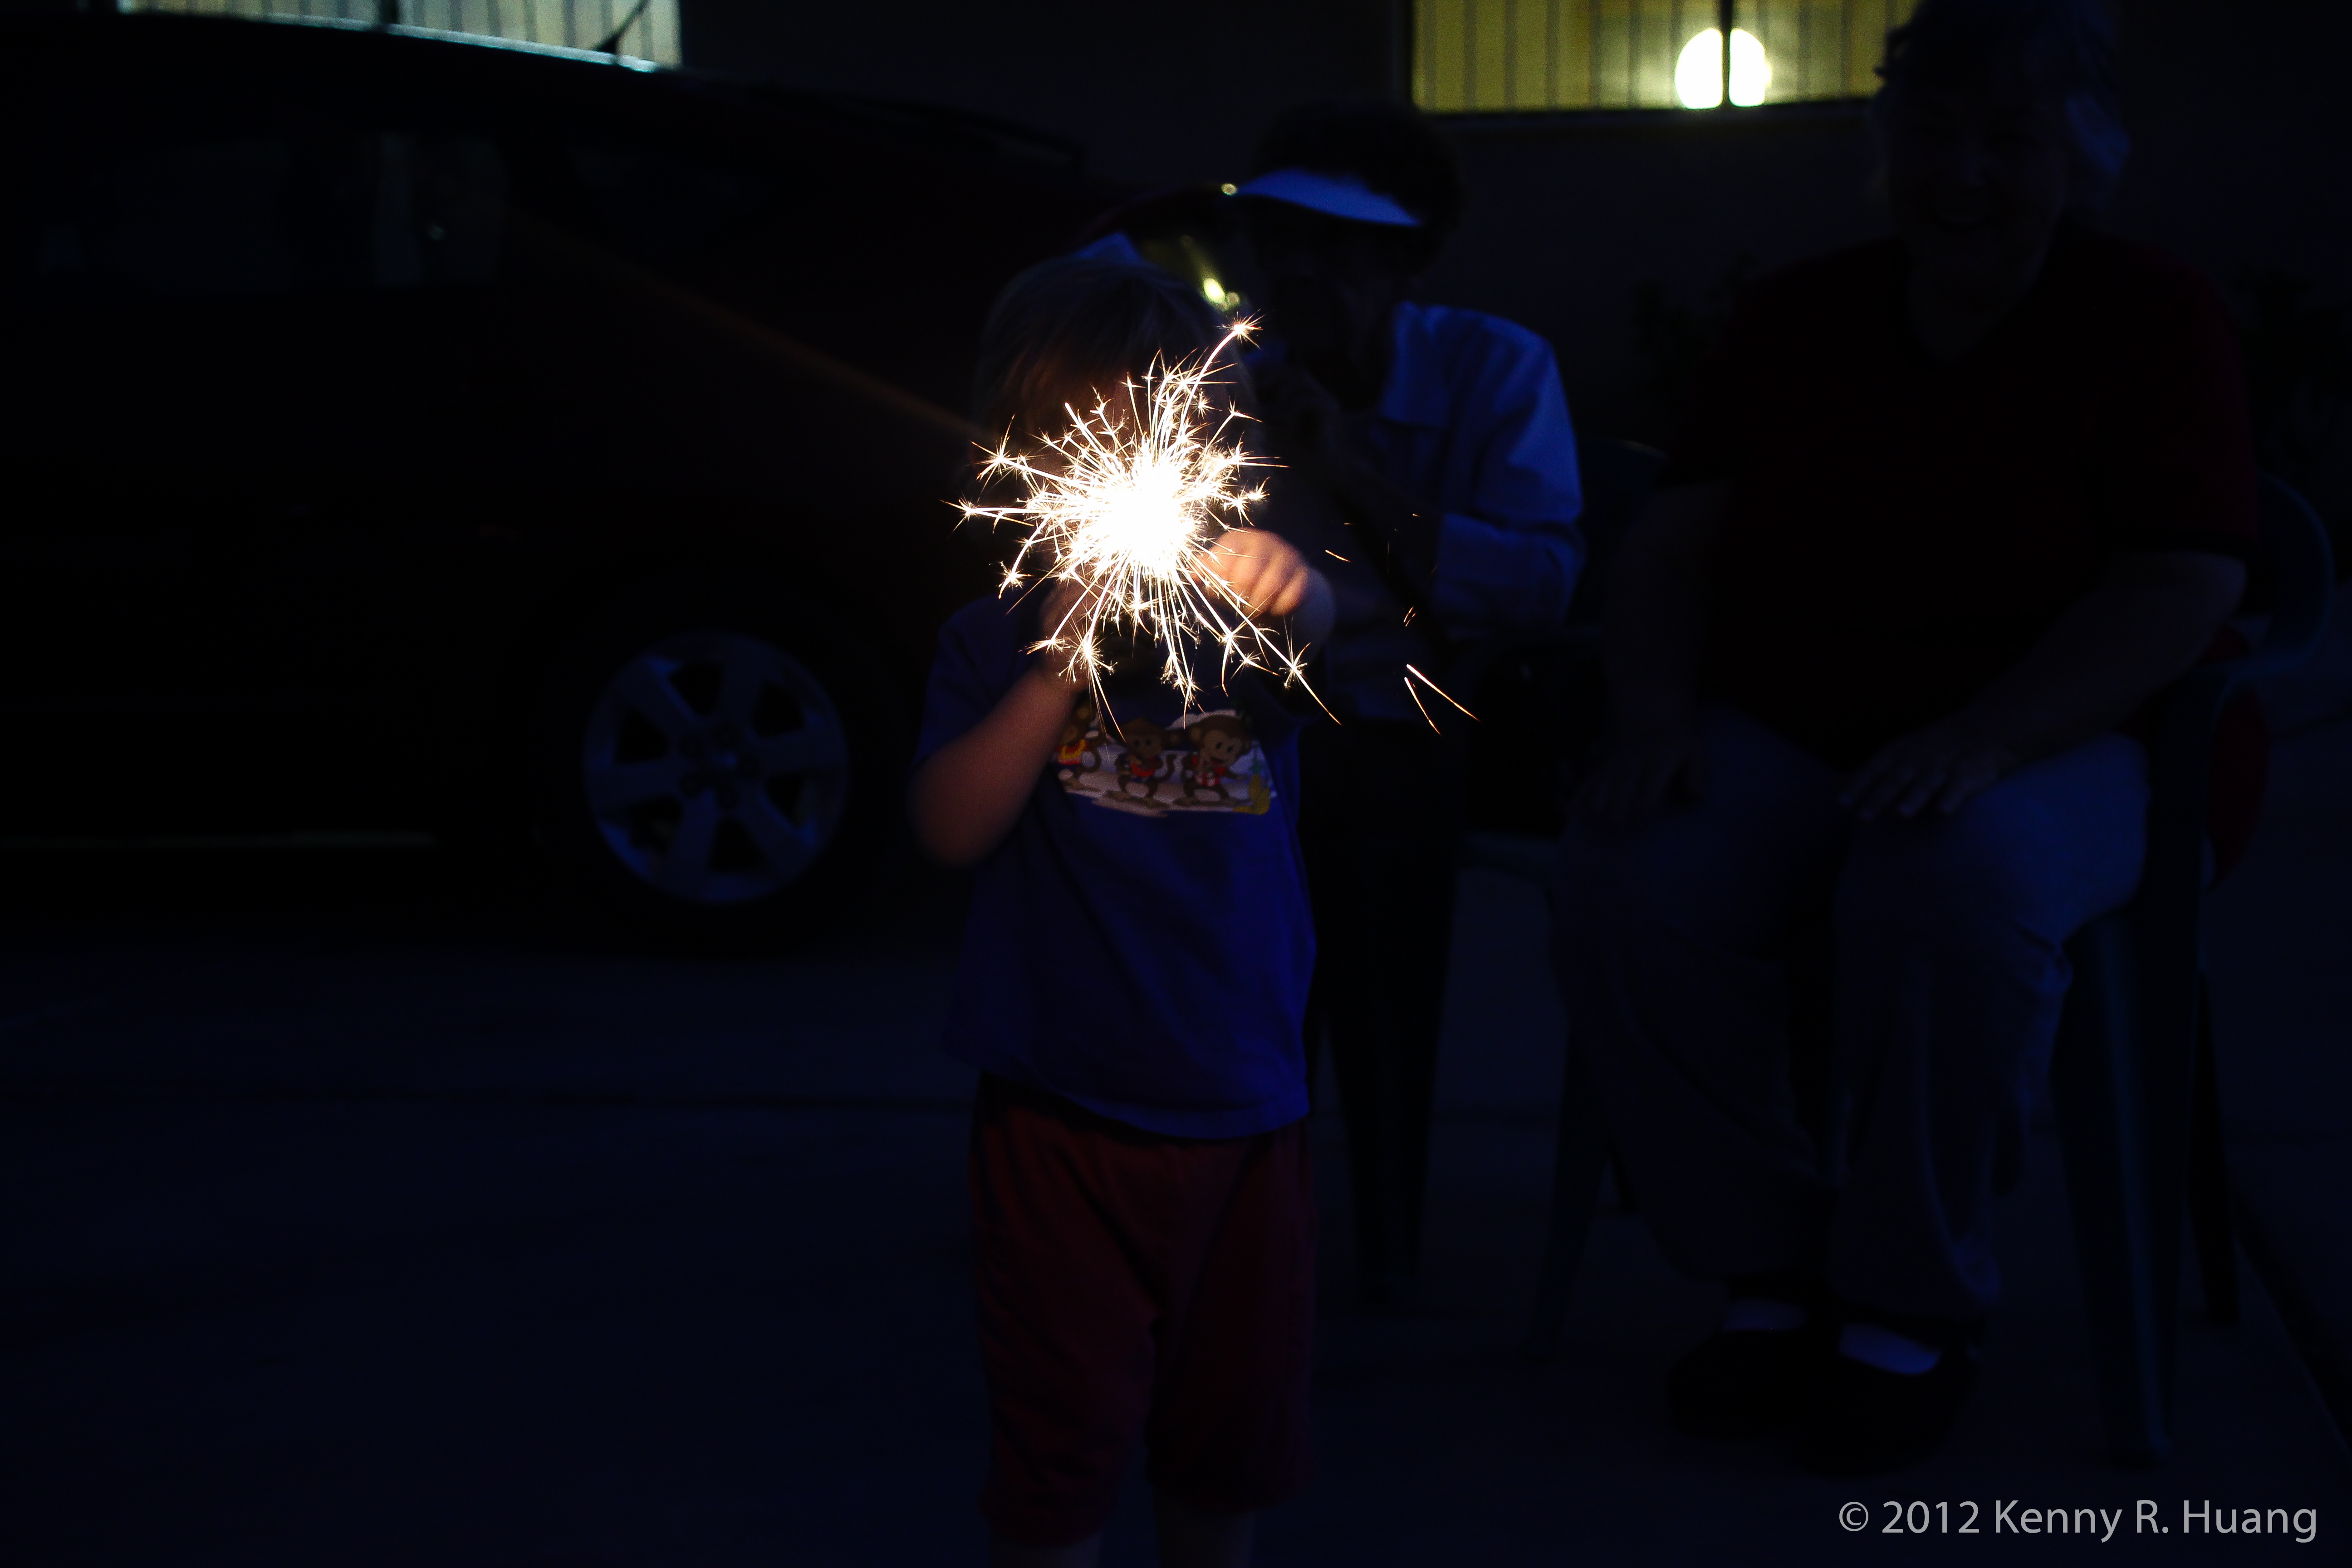 2012-kenny-r-huang-8215